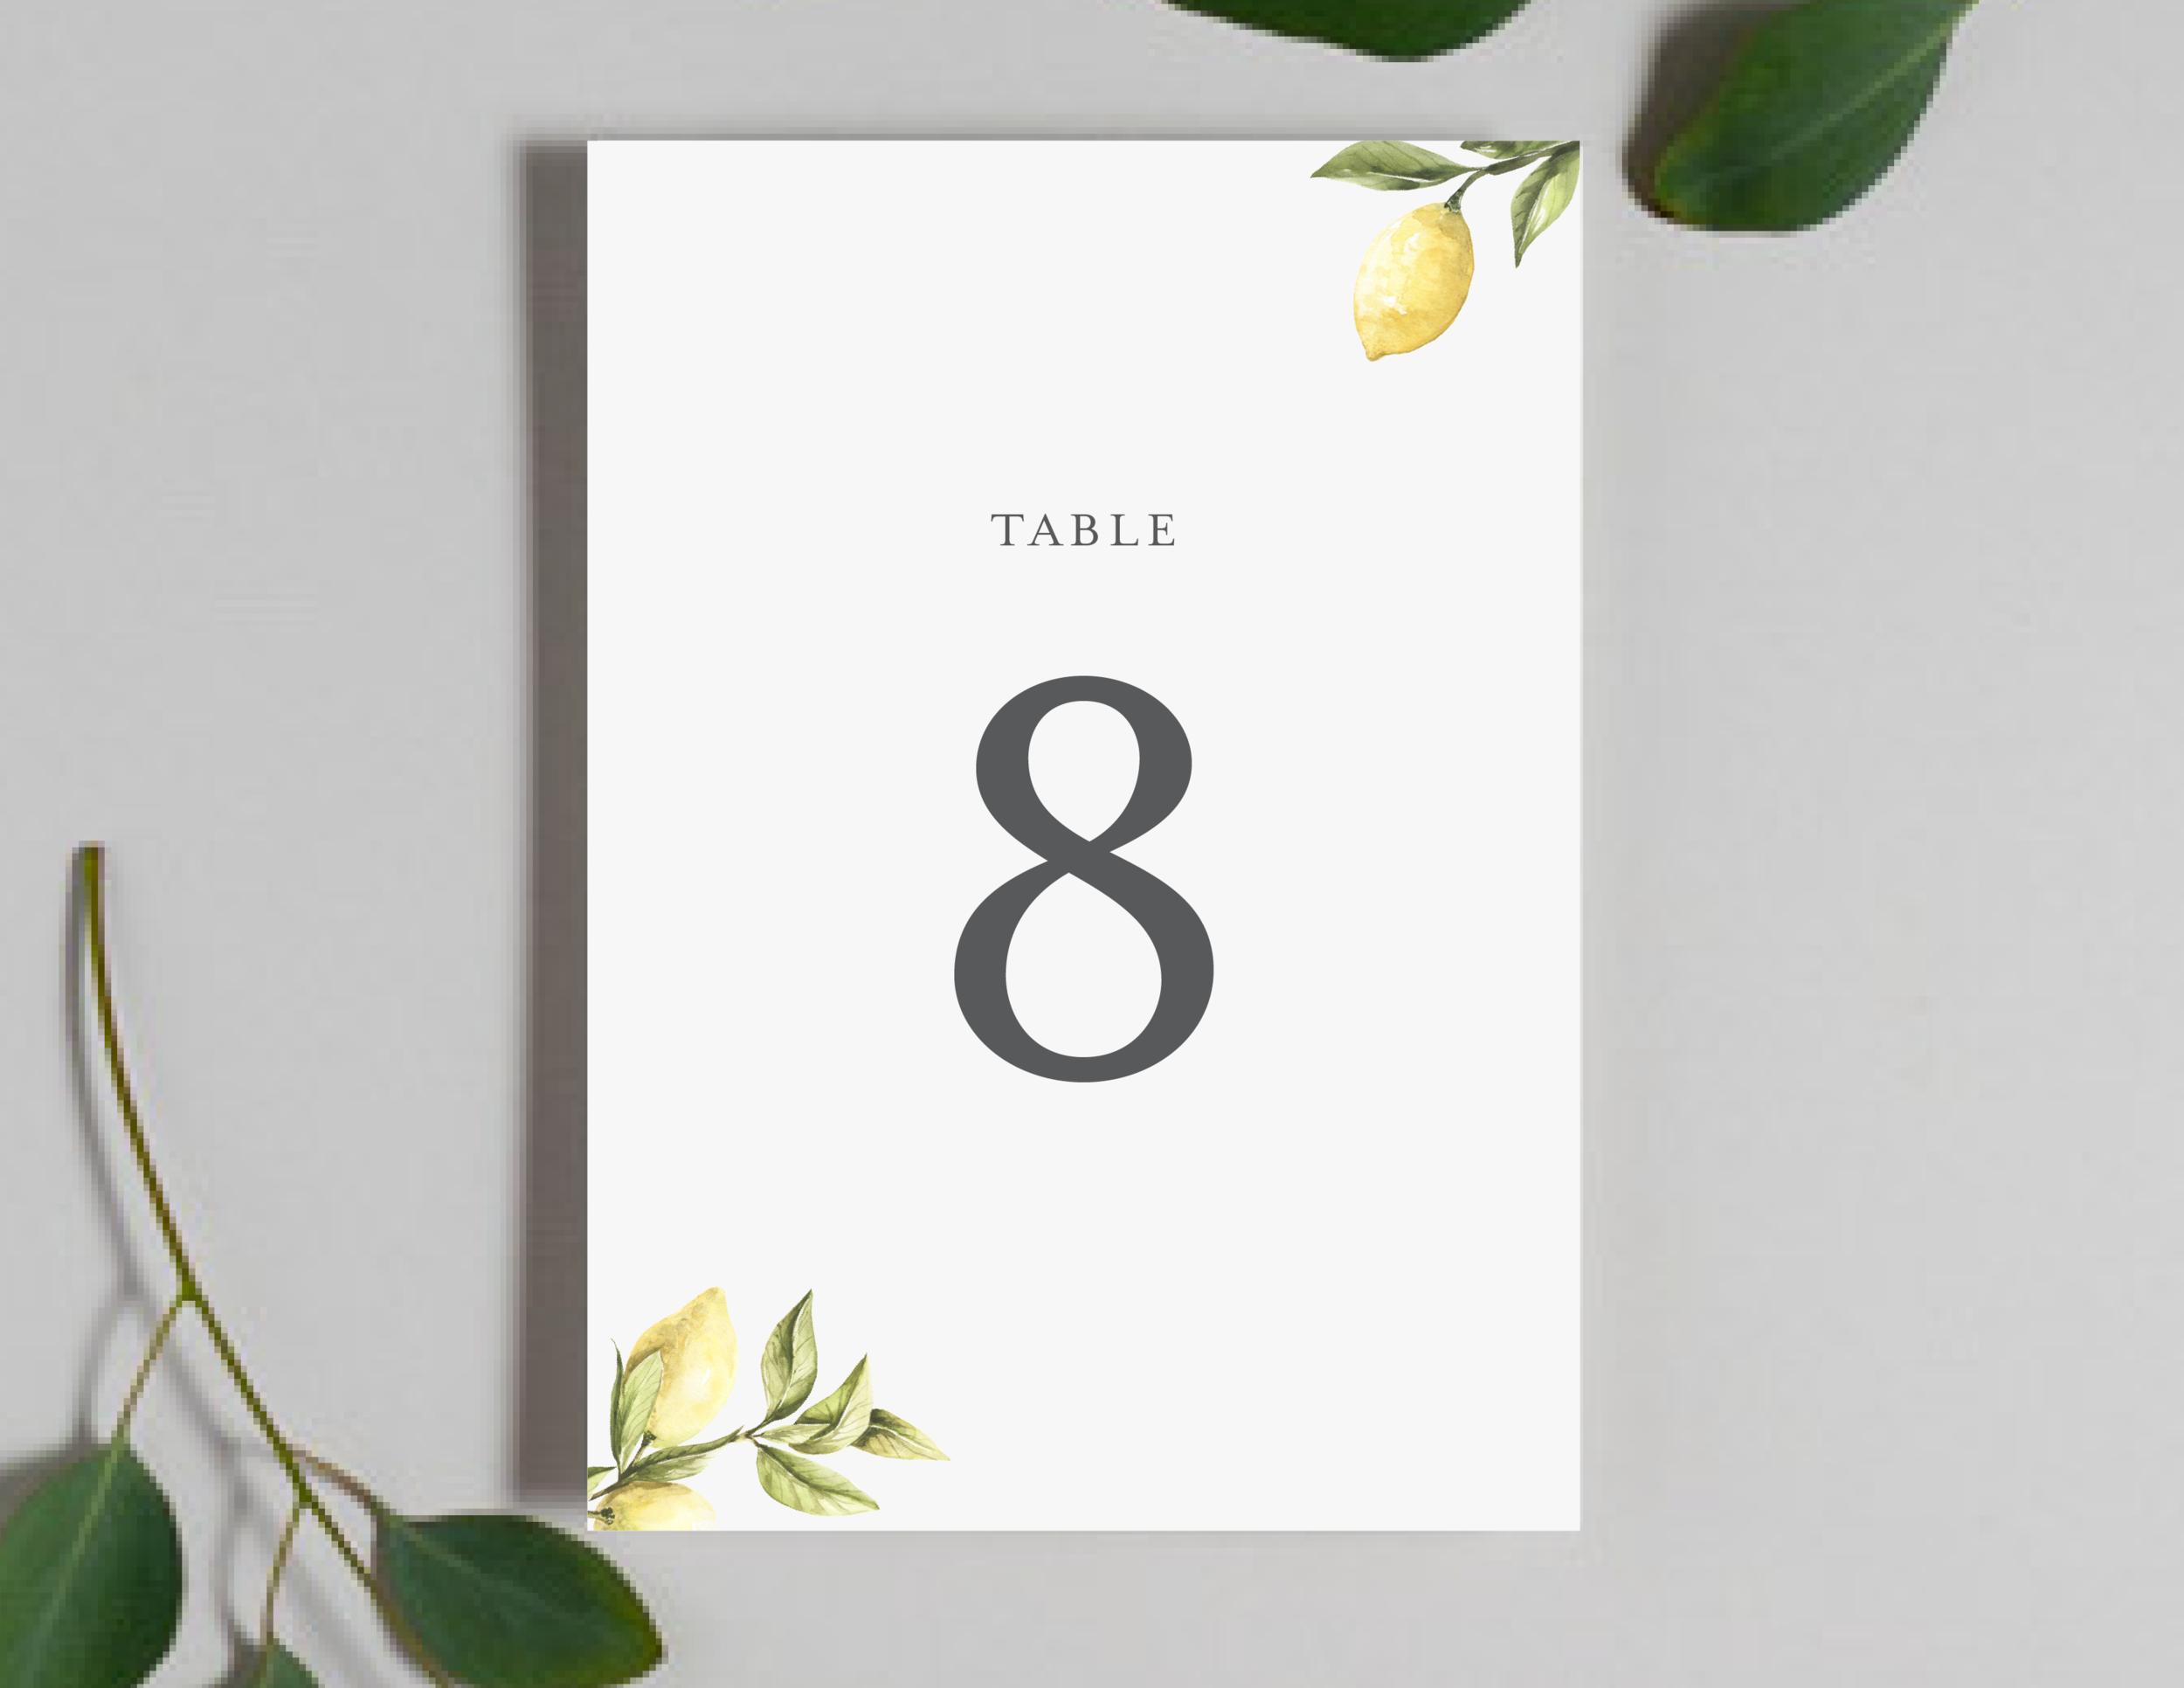 Lemon Citrus Table Numbers by Just Jurf Designs-01.png